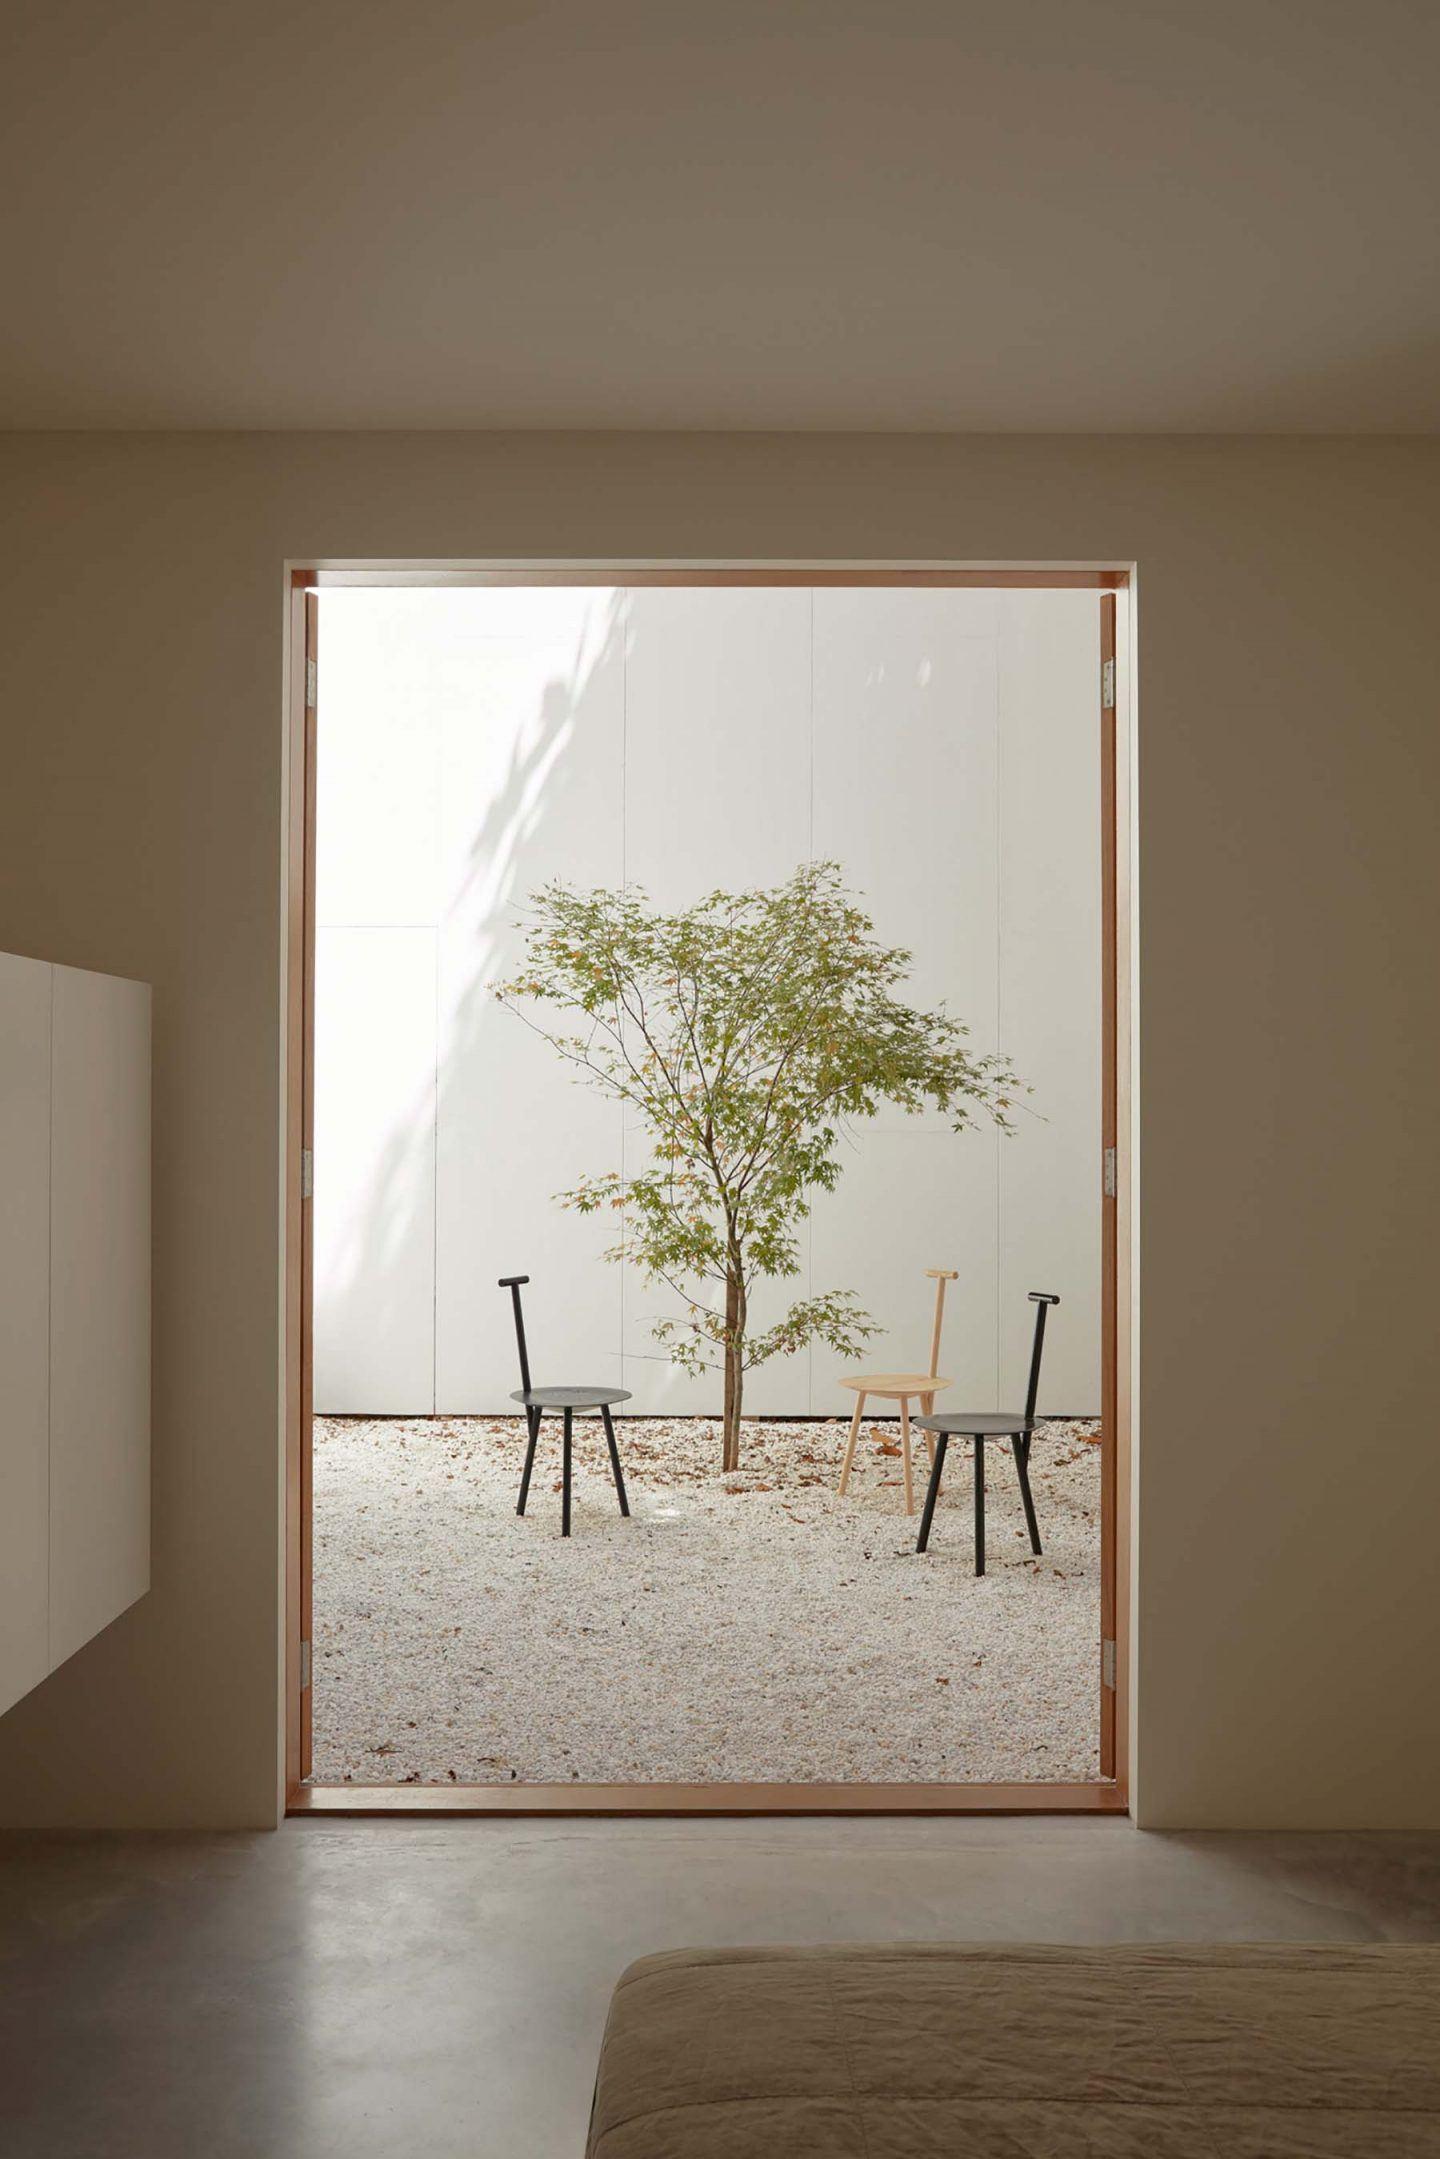 IGNANT-Architecture-Oliver-du-Puy-Architects-Skinny-House-14